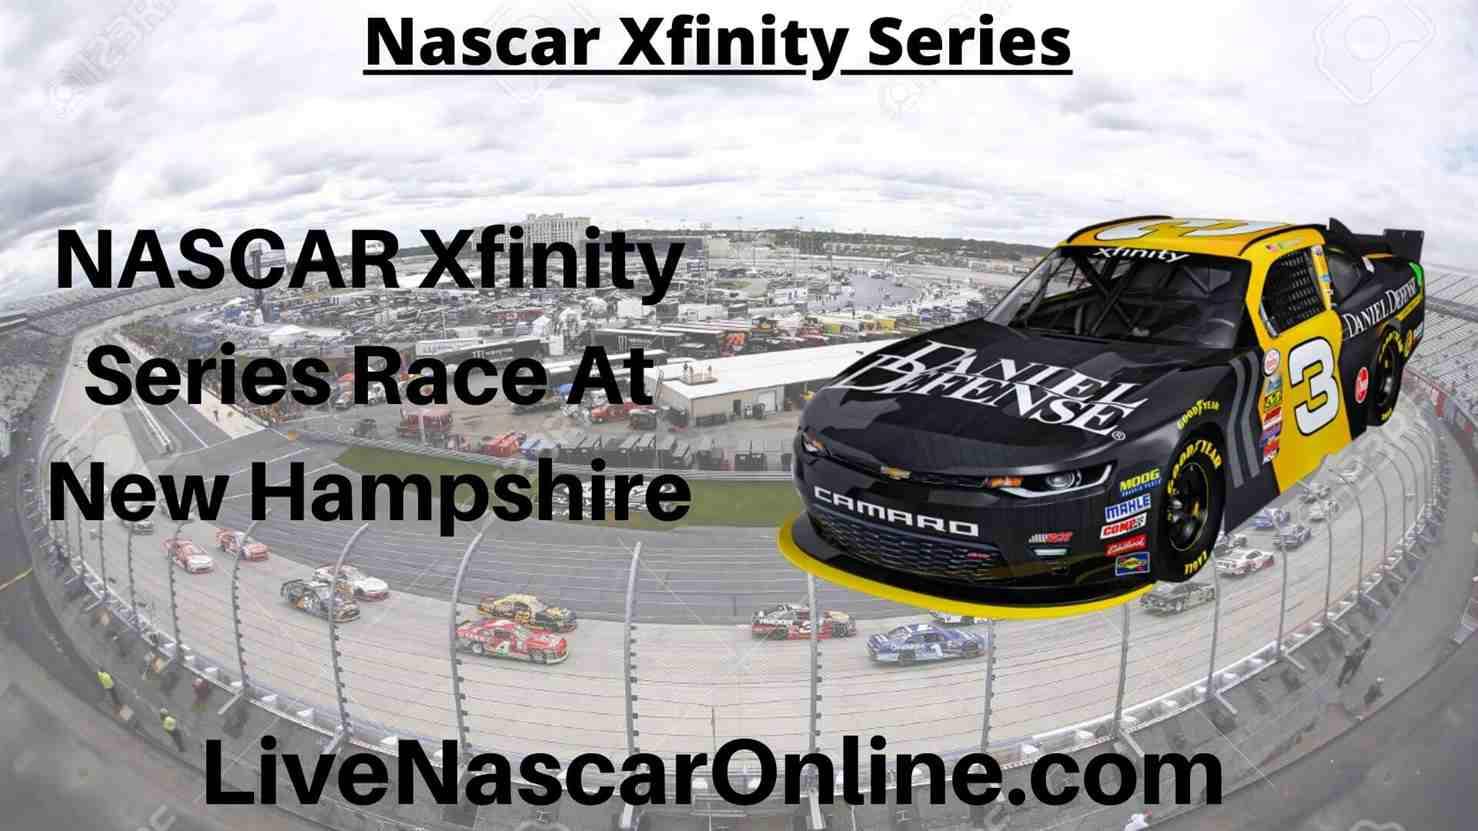 NASCAR Xfinity Series Online Stream | NASCAR New Hampshire 2020